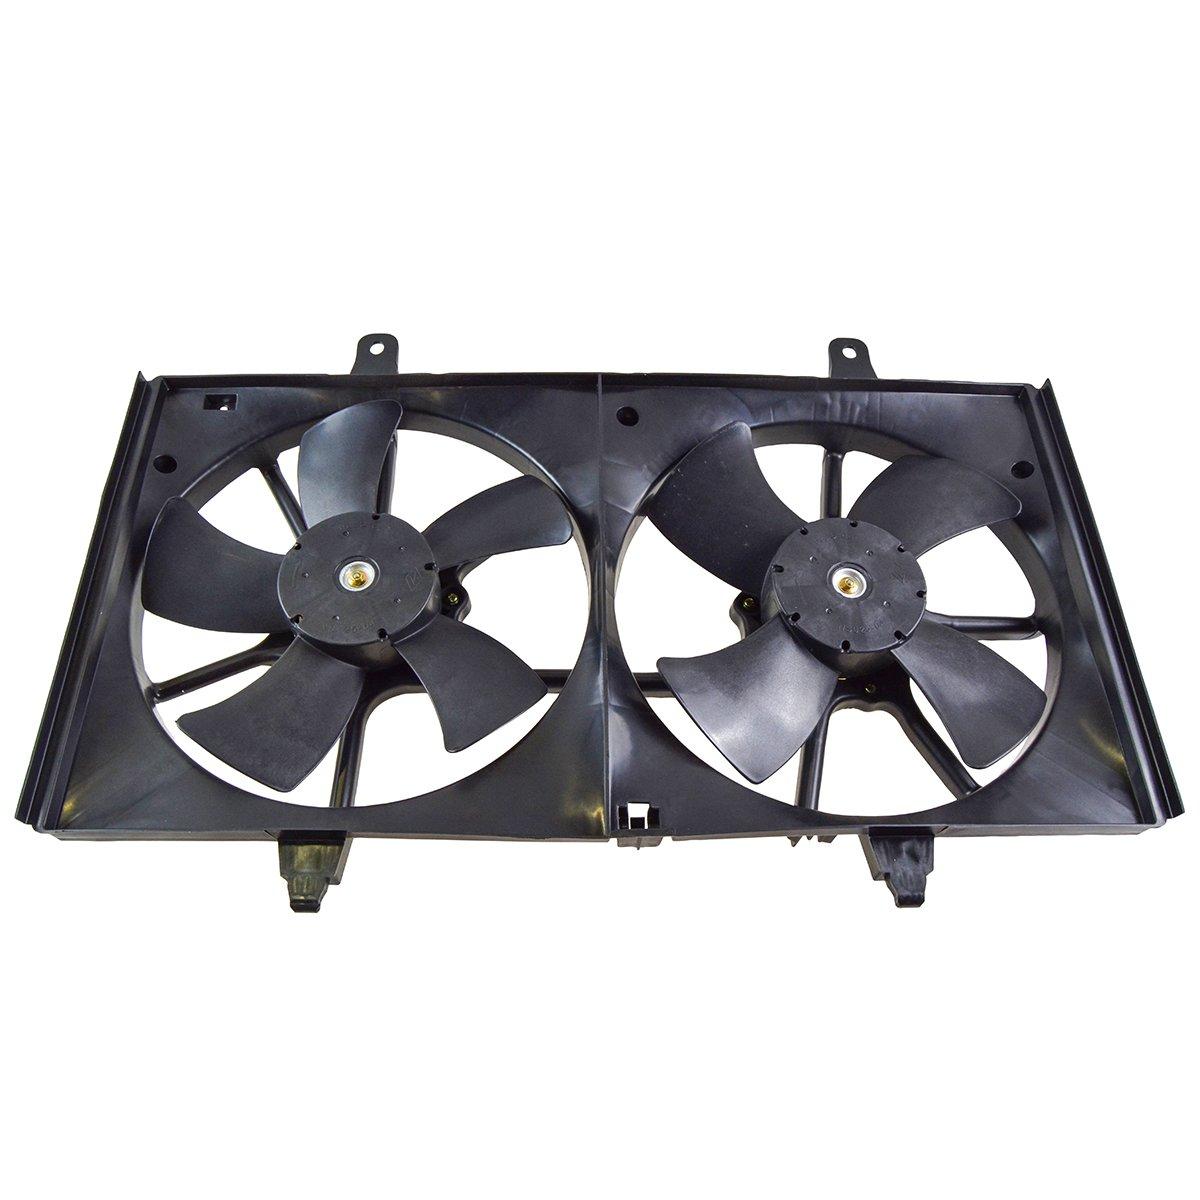 Dual Radiator Cooling Fan w/Motor for 02-06 Nissan Altima 2.5L